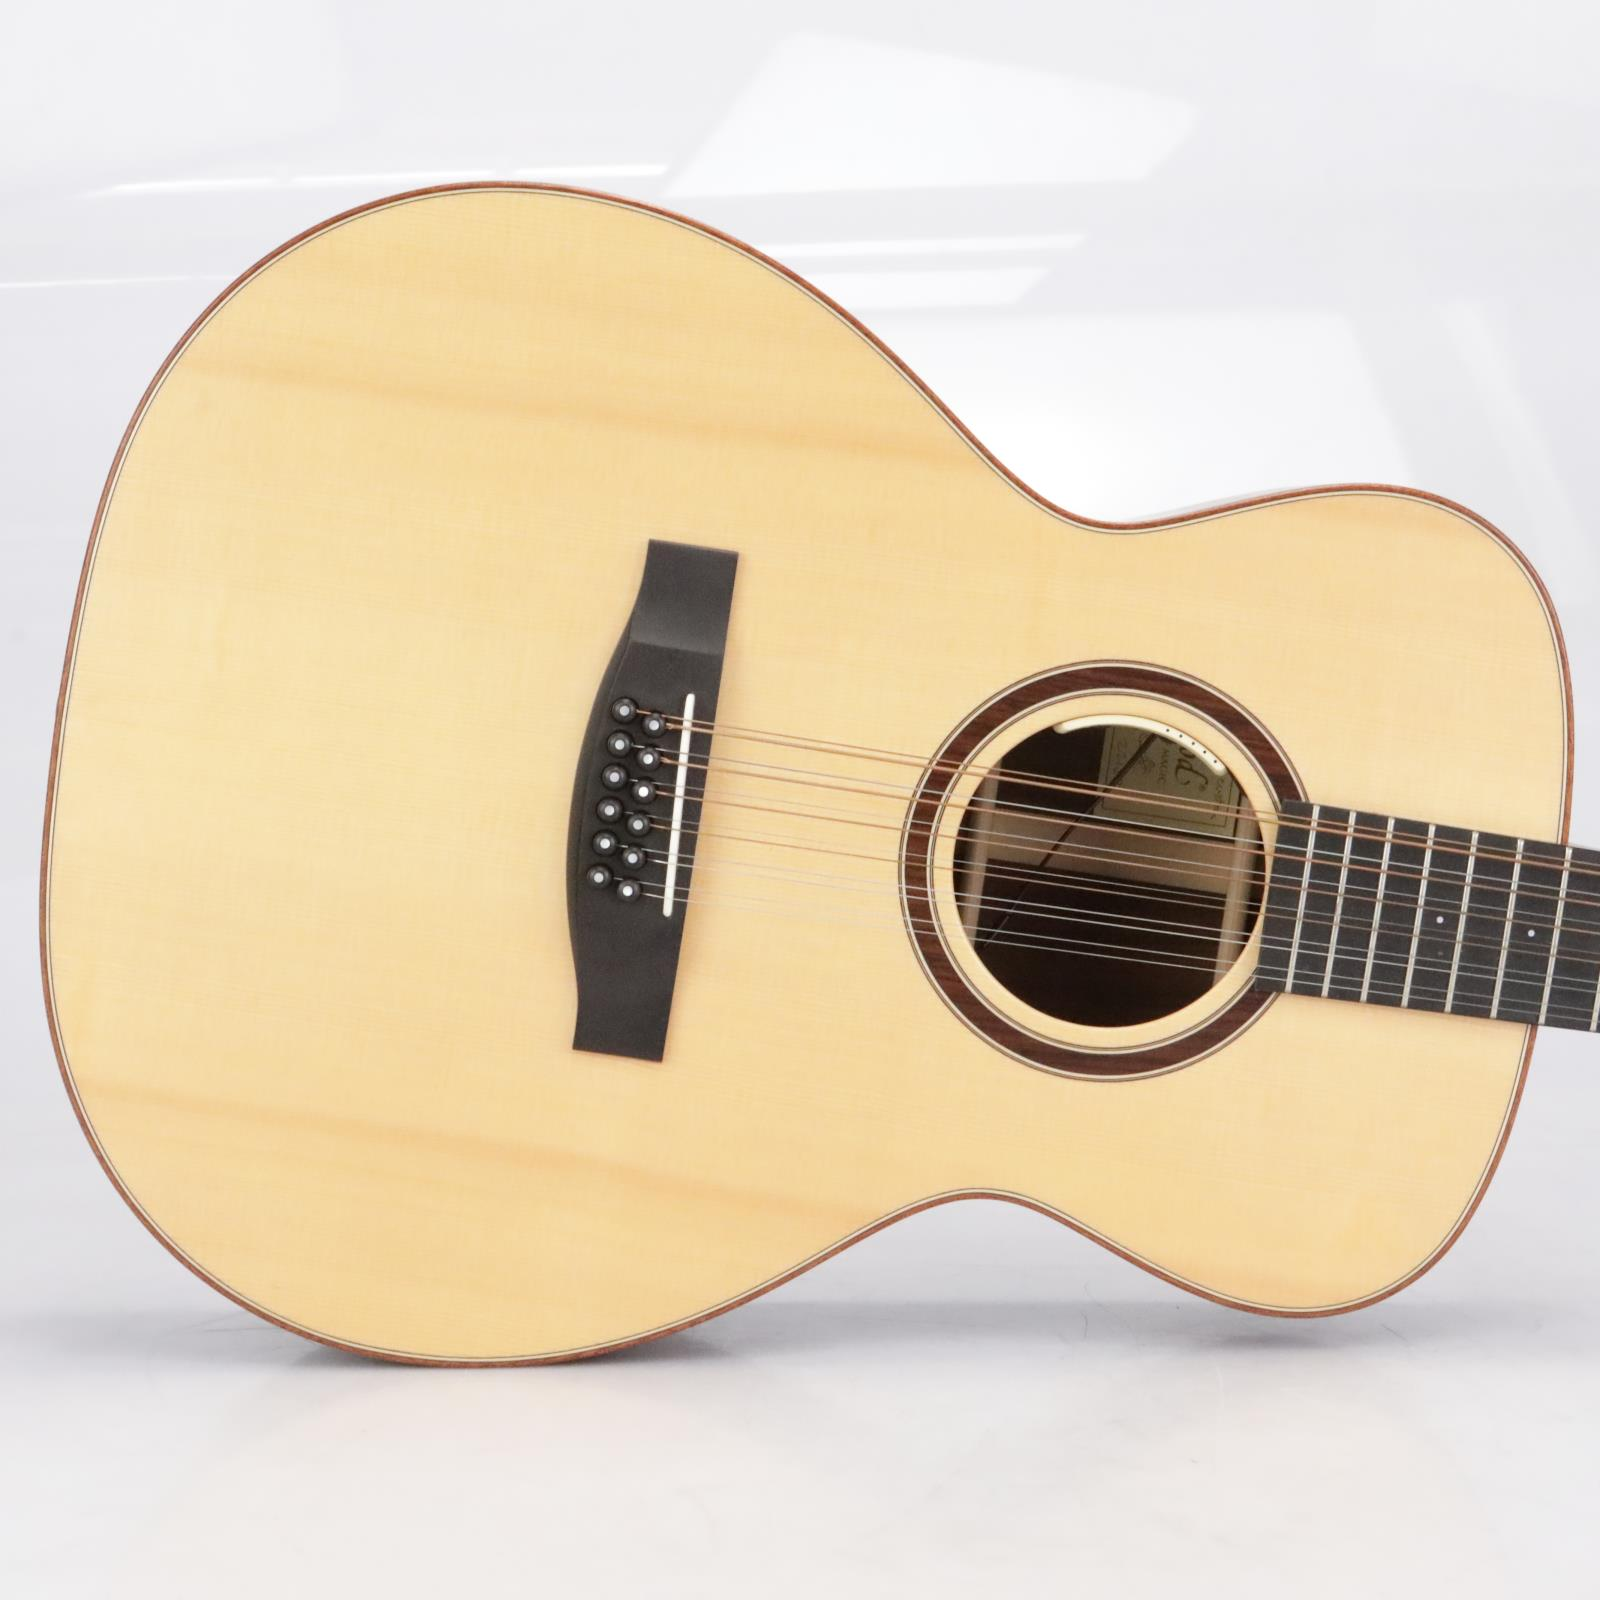 Lakewood M-31 Custom 12-String Acoustic Guitar w/ Case #41865